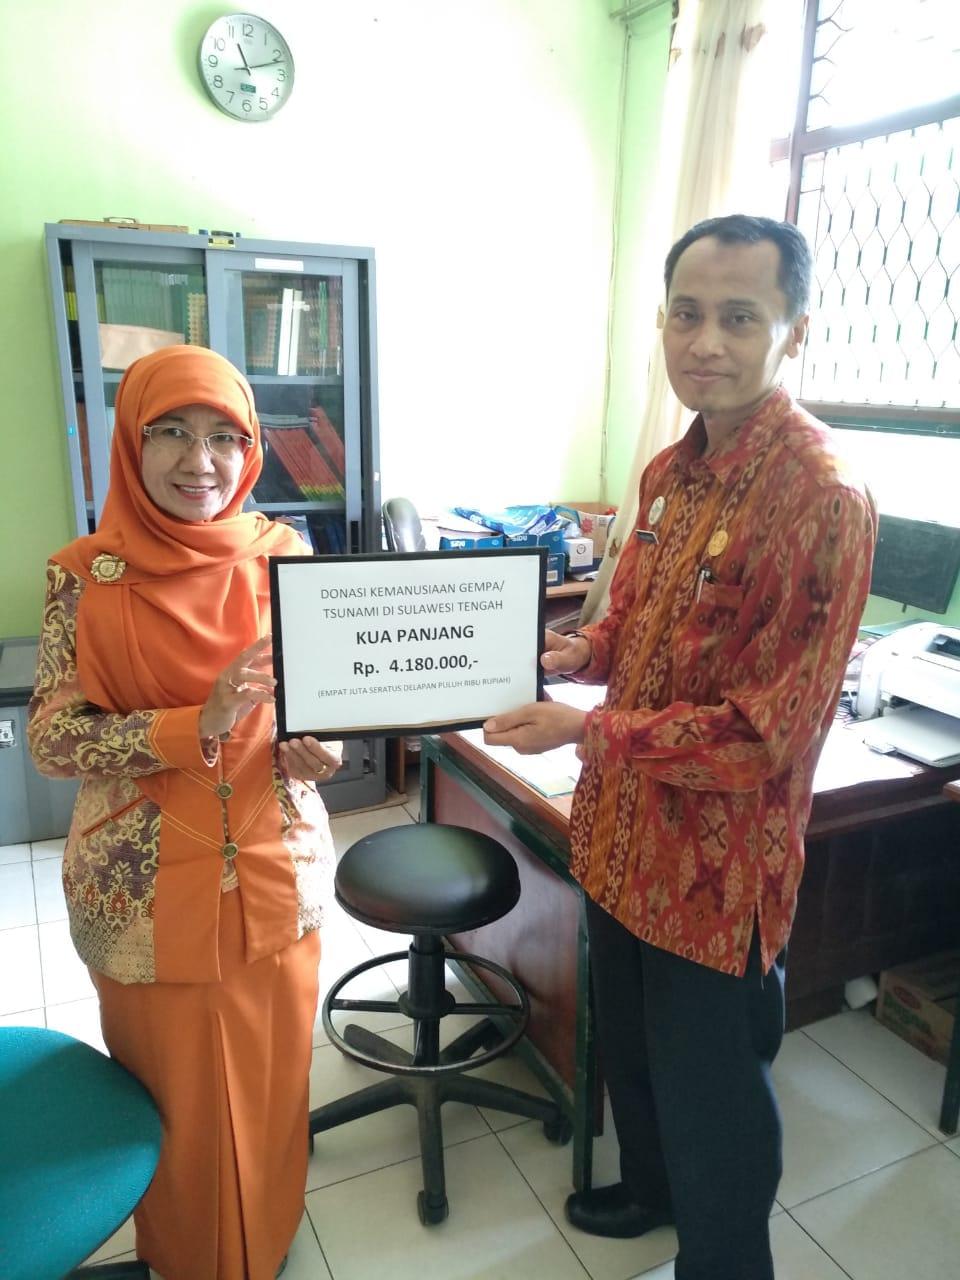 Pegawai KUA Panjang Dan Tokoh Masyarakat Galang Dana Peduli Gempa Dan Tsunami Palu - Donggala